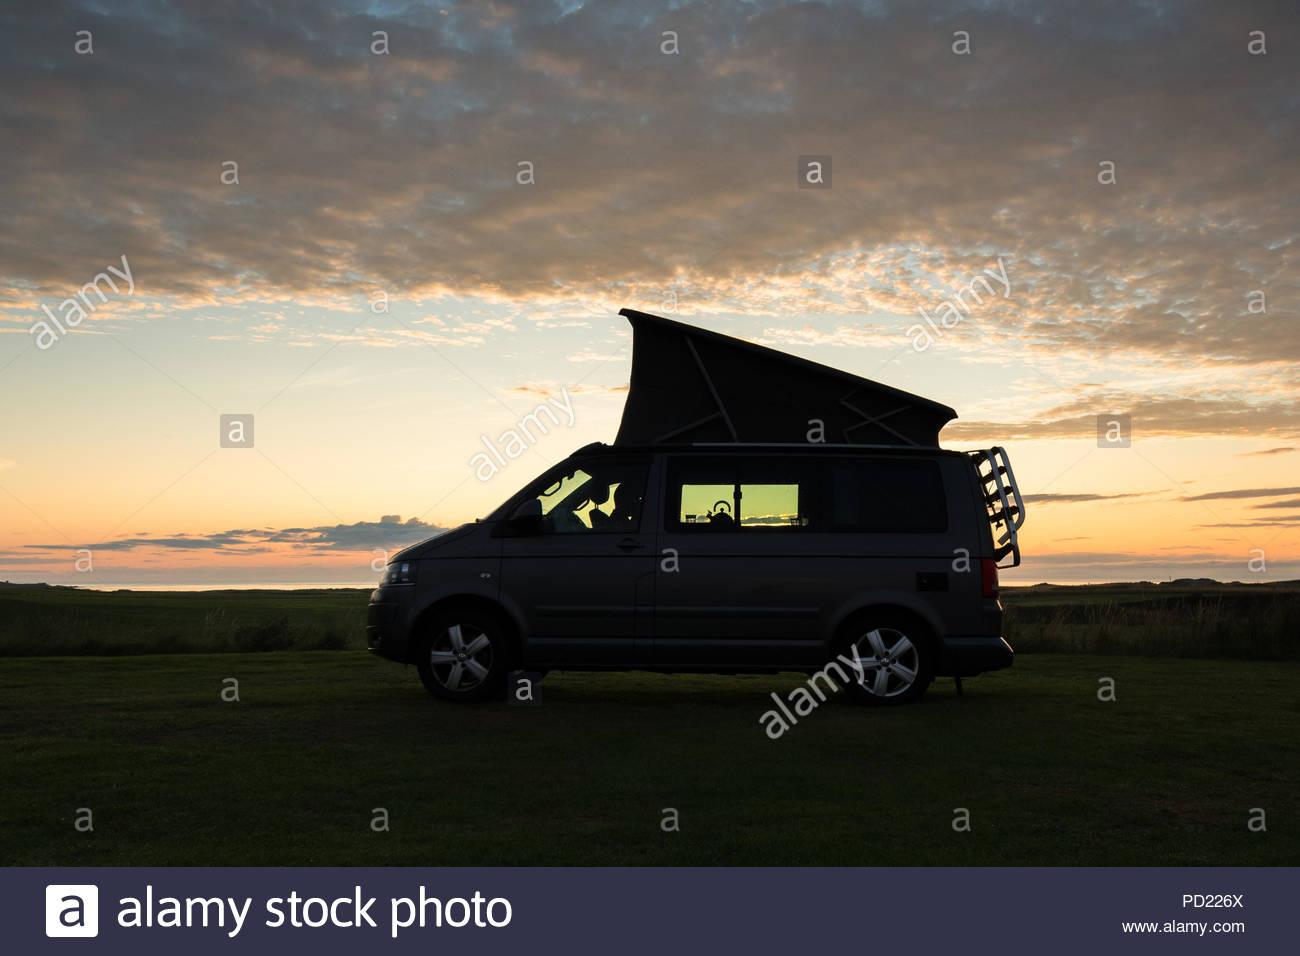 campervan vw  silhouette at sunset, Scotland, UK - Stock Image